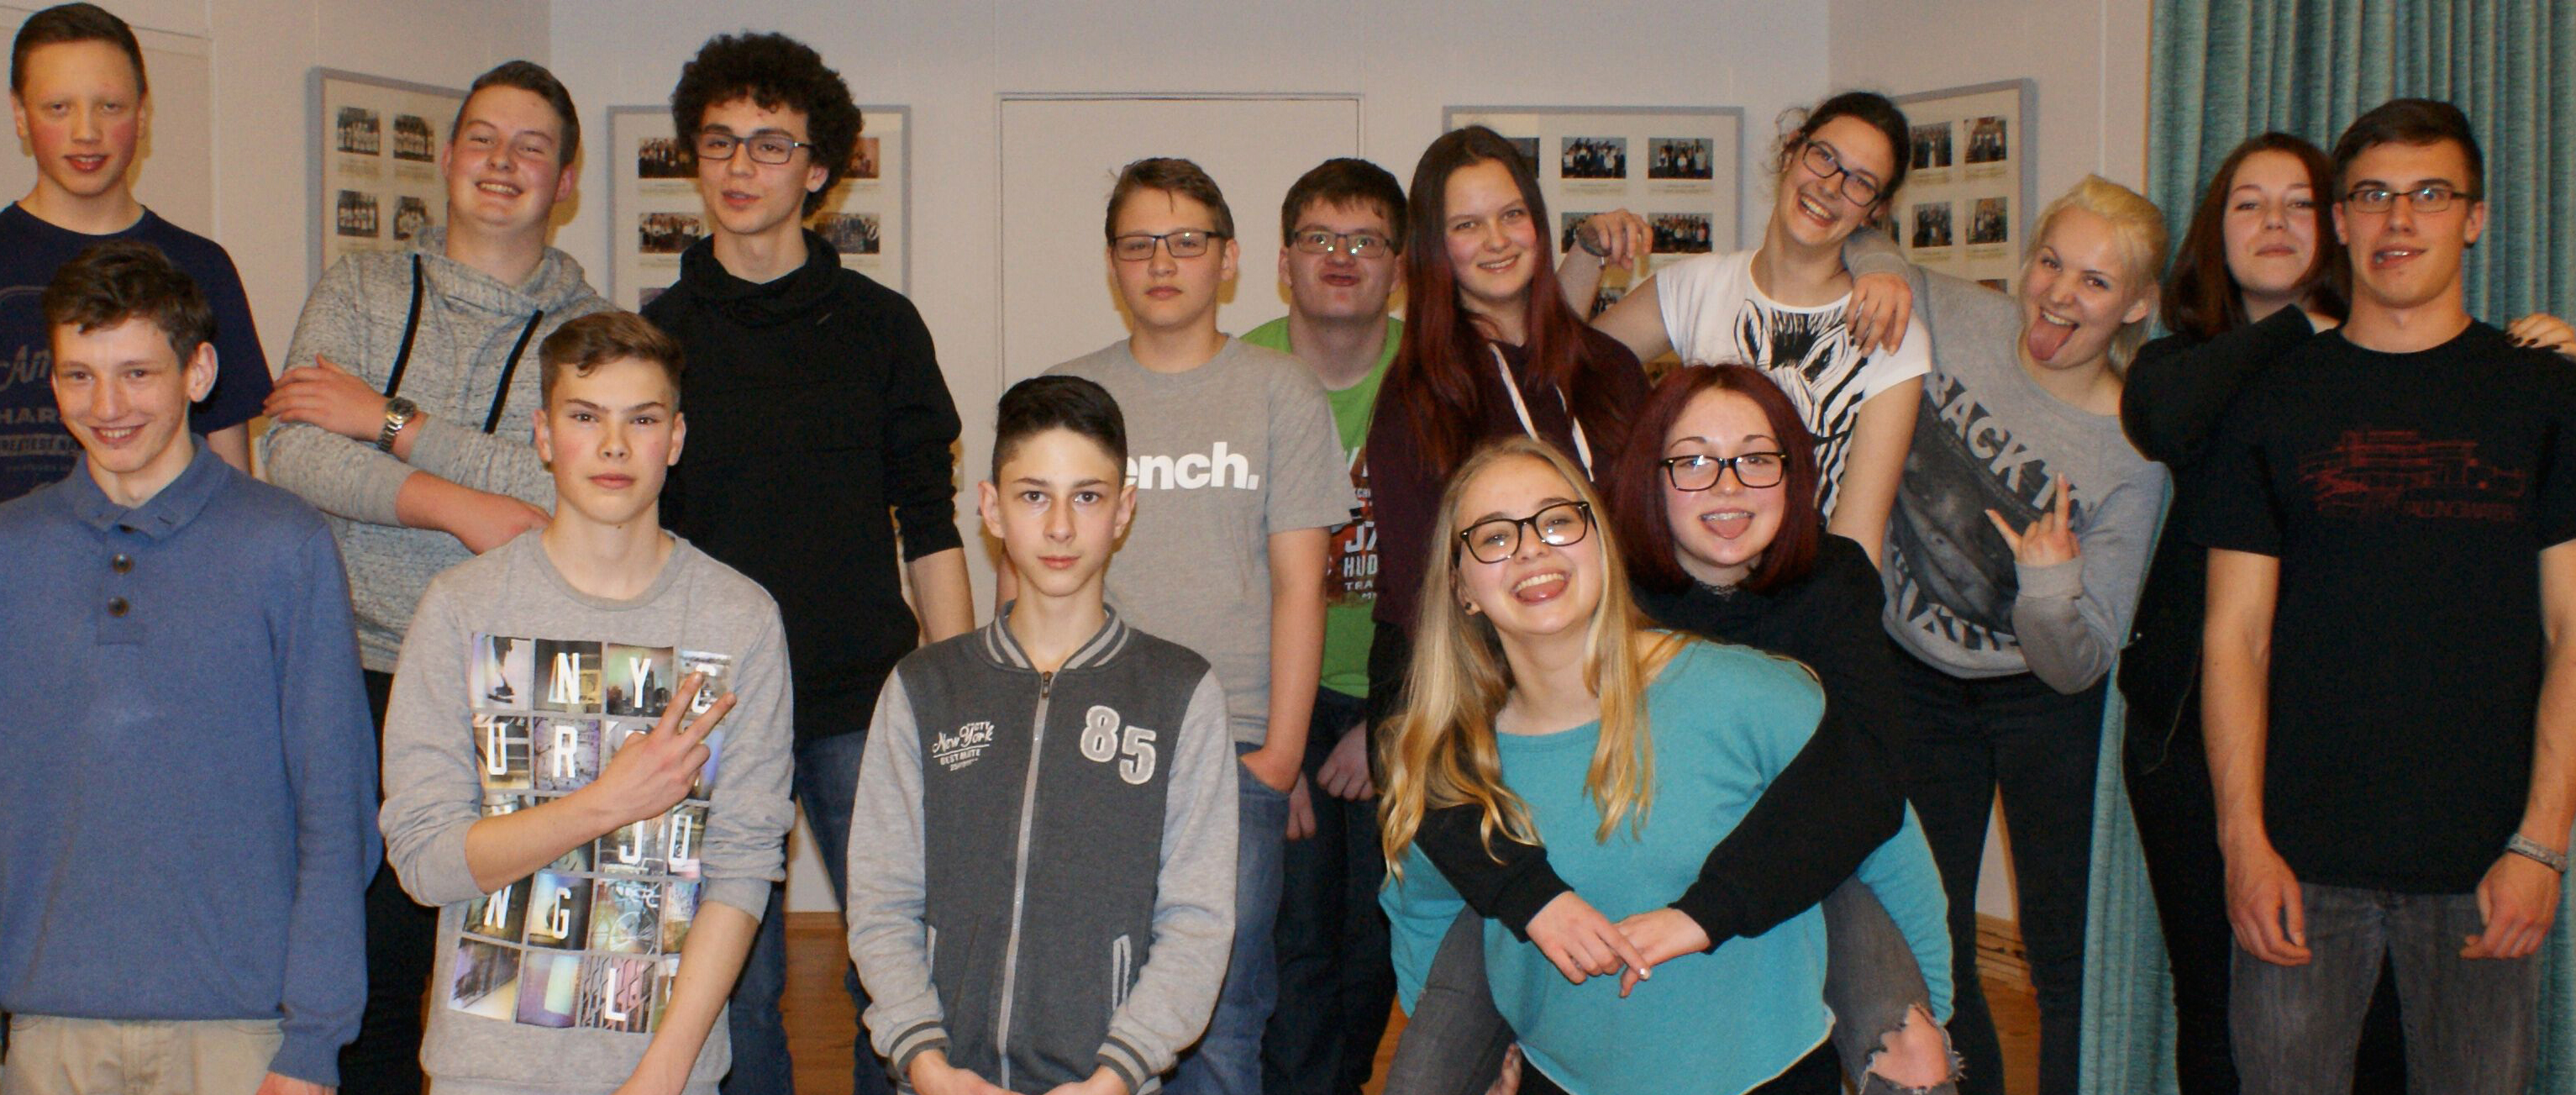 Jugendkreis bearbeitet